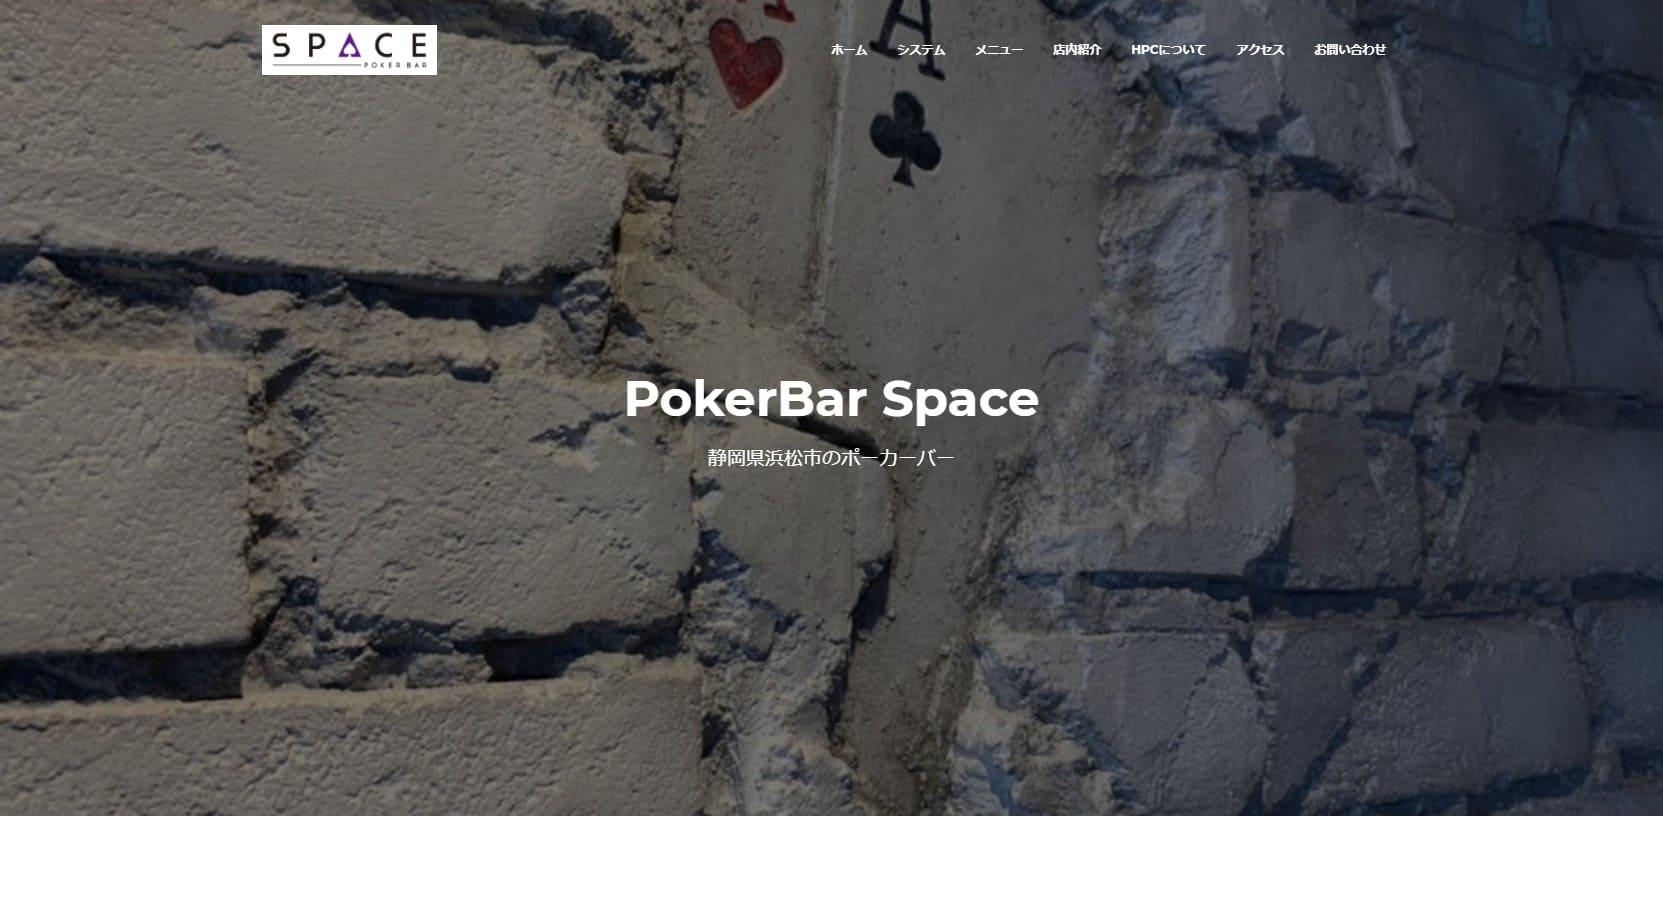 PokerBar Spaceのウェブサイト画像。